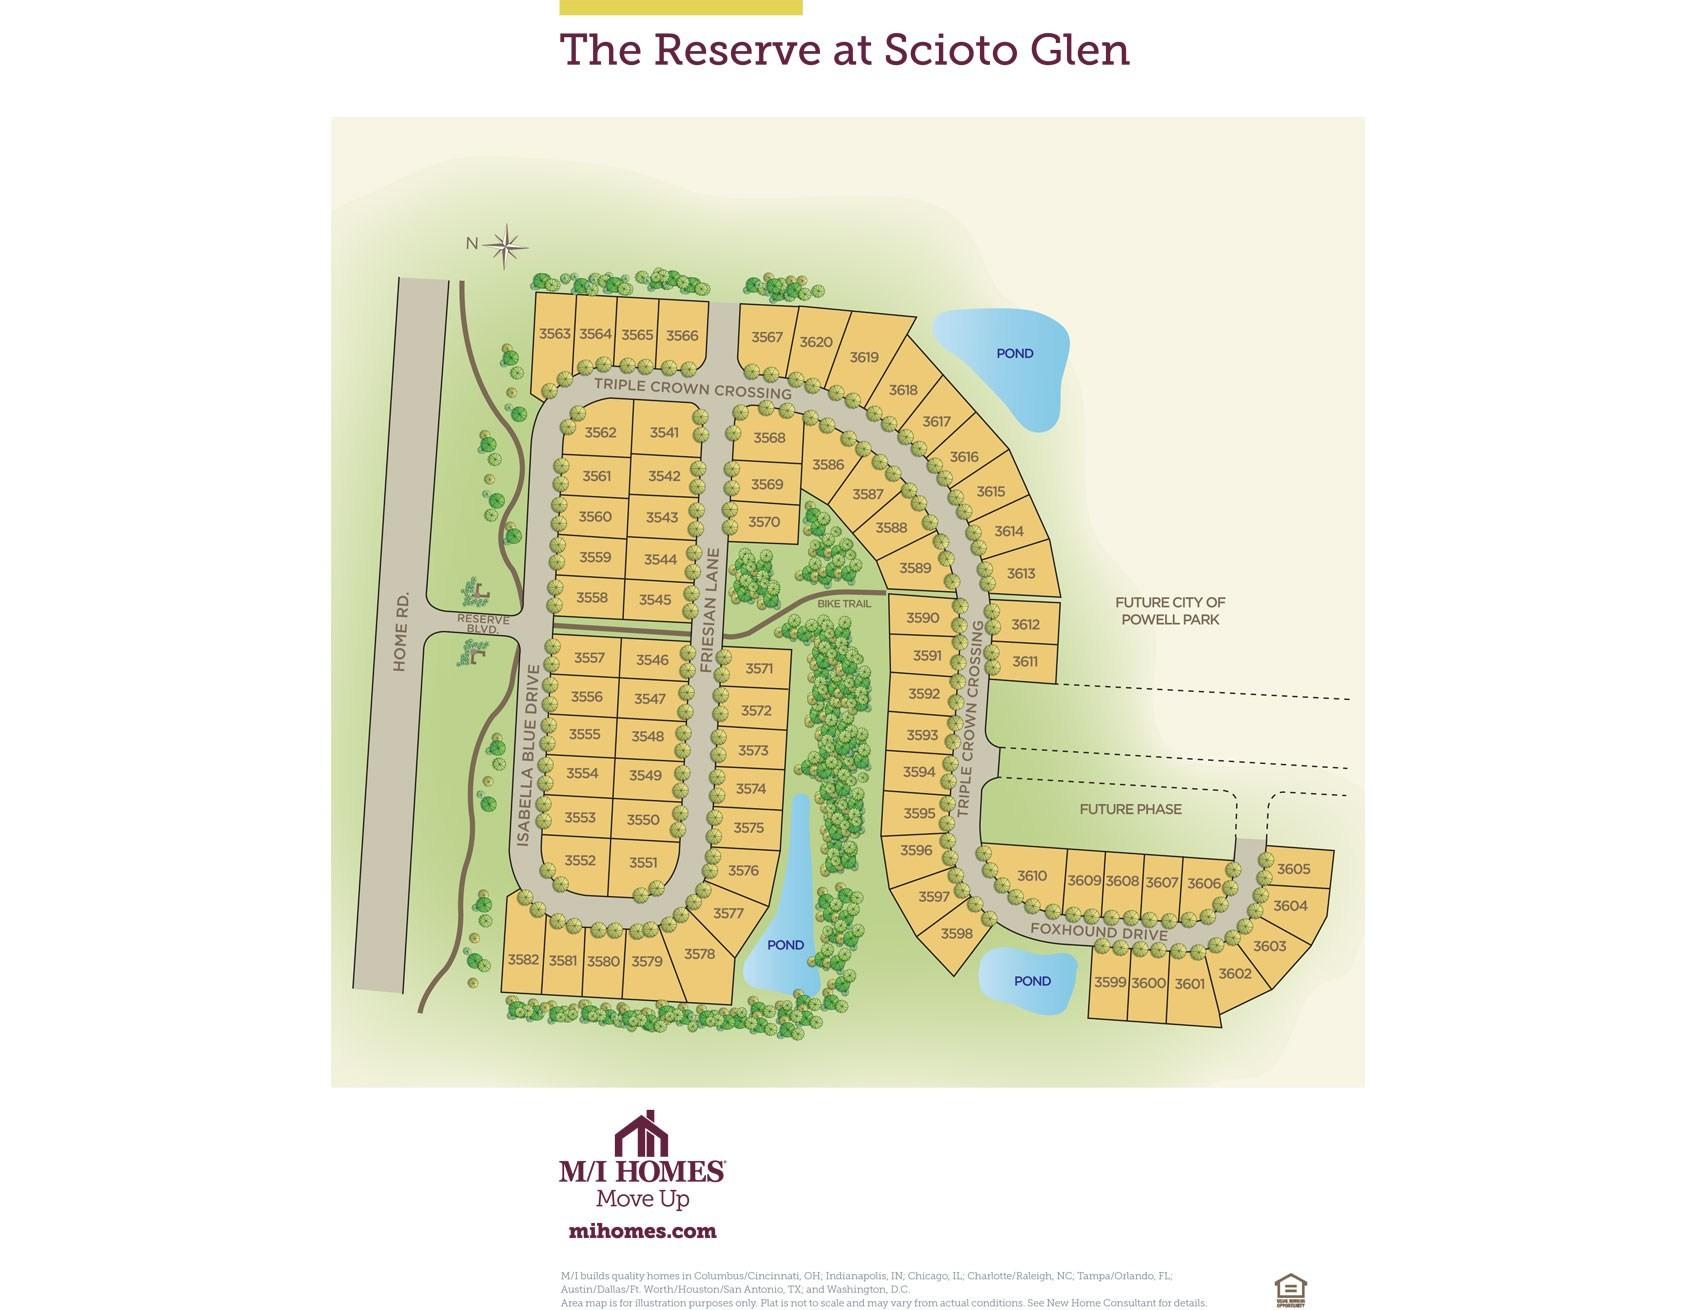 The Reserve At Scioto Glenn